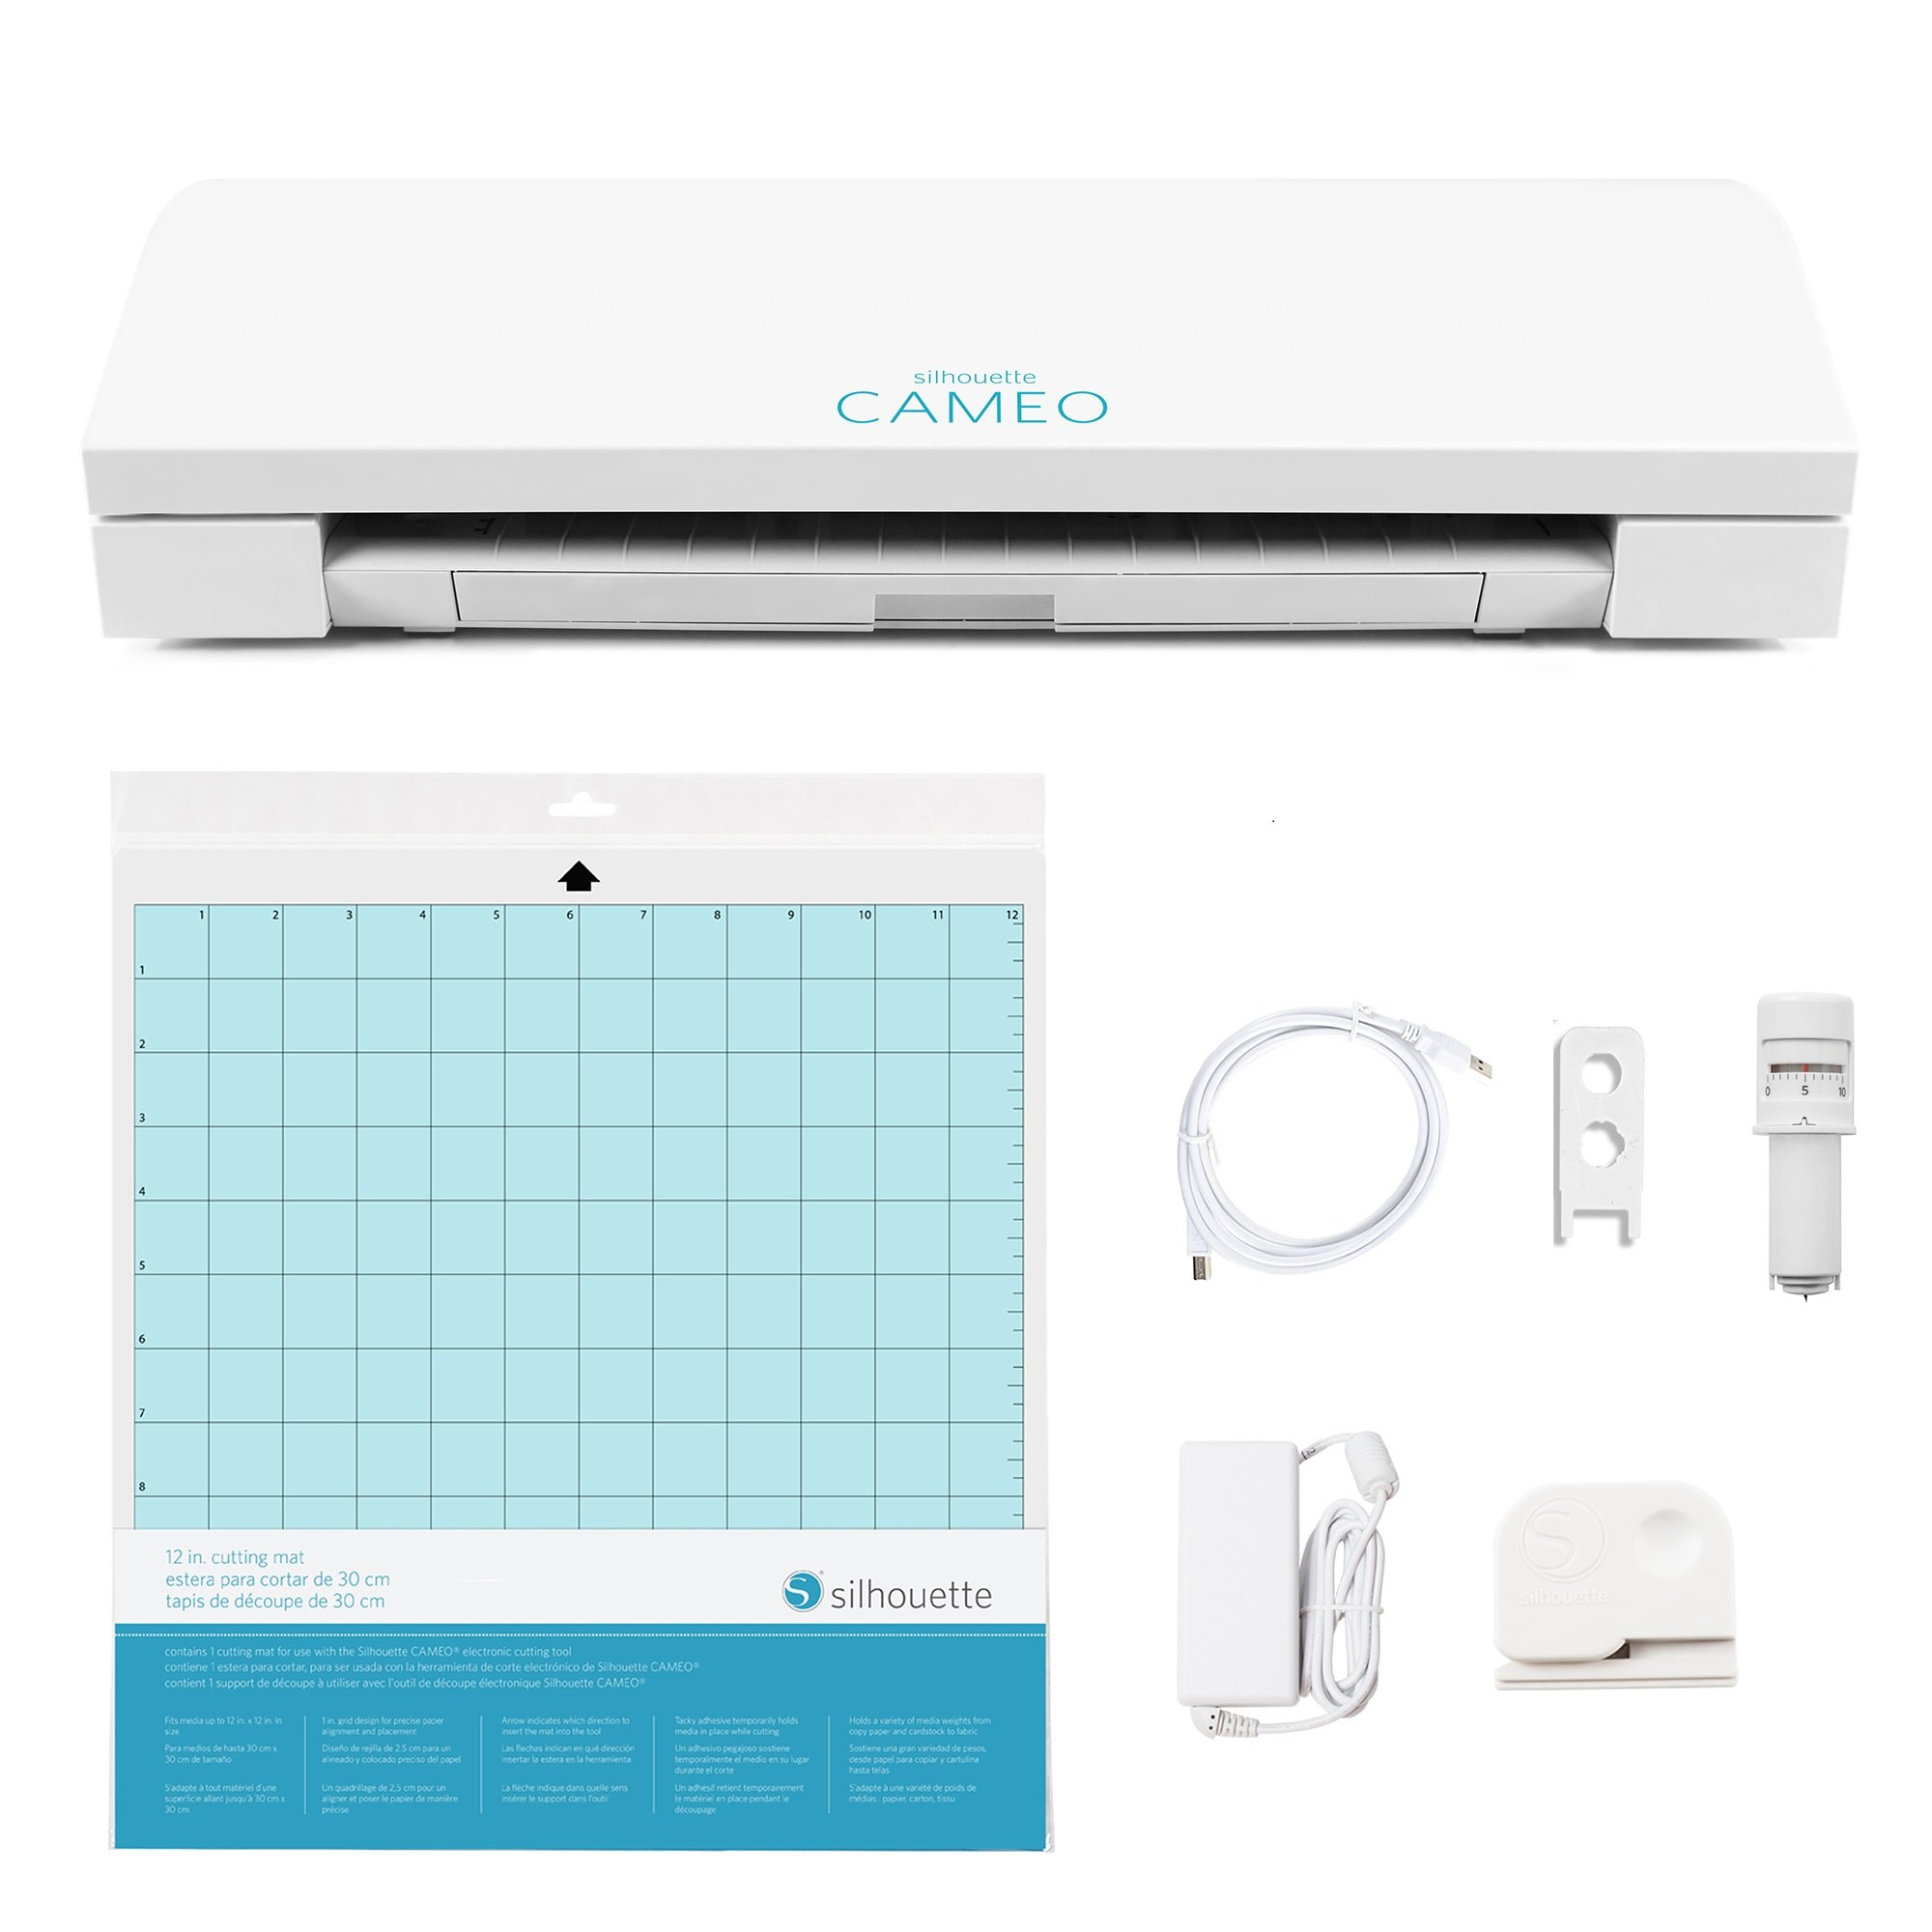 ویکالا · خرید  اصل اورجینال · خرید از آمازون · Silhouette SILHOUETTE-CAMEO-3-4T Cameo 3 Wireless Cutting Machine-AutoBlade-Dual Carriage-Studio Software, White wekala · ویکالا